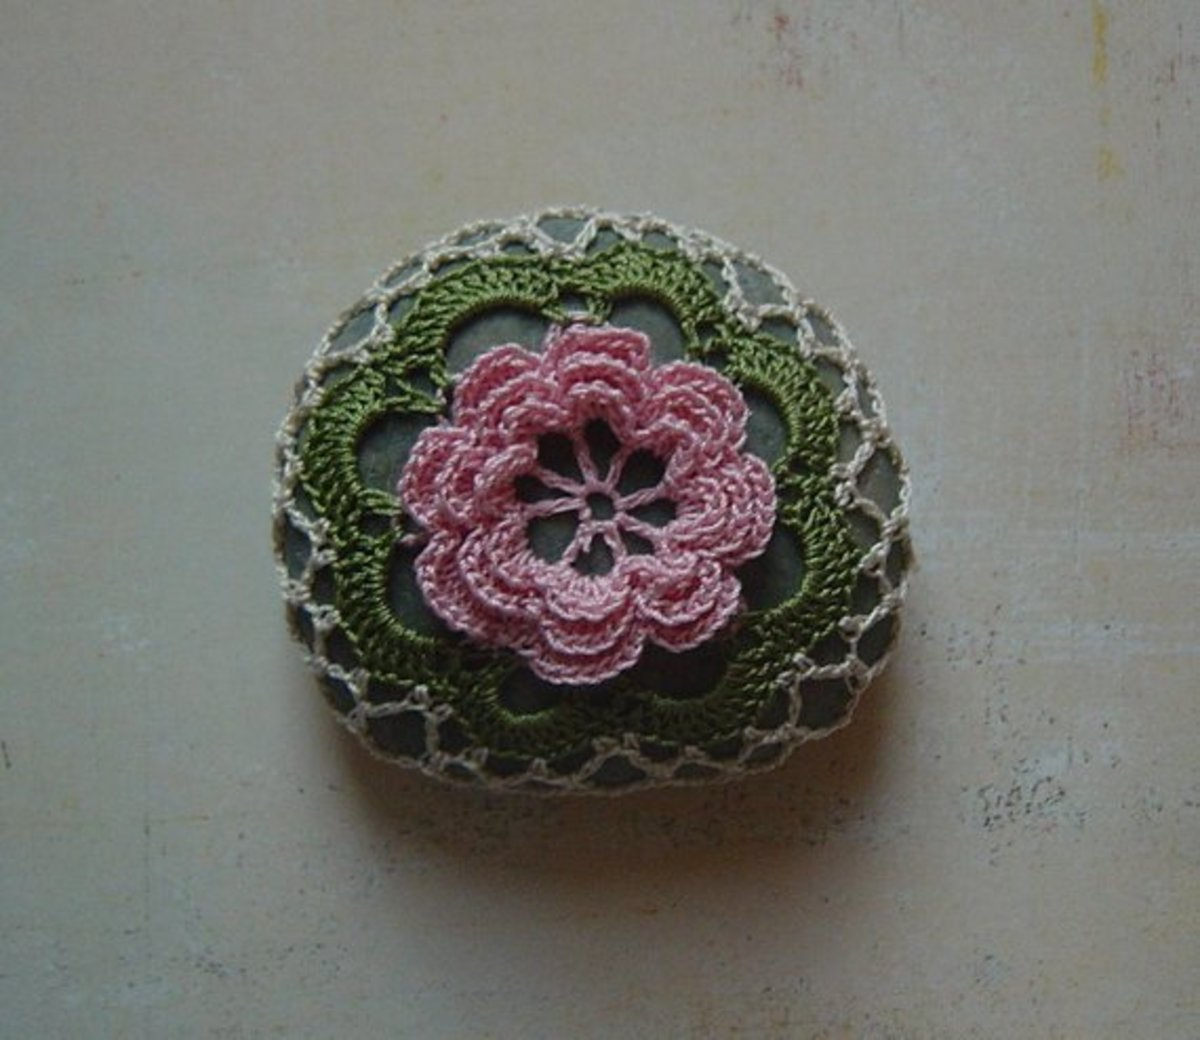 Crocheted flower lace stone by Monicaj.